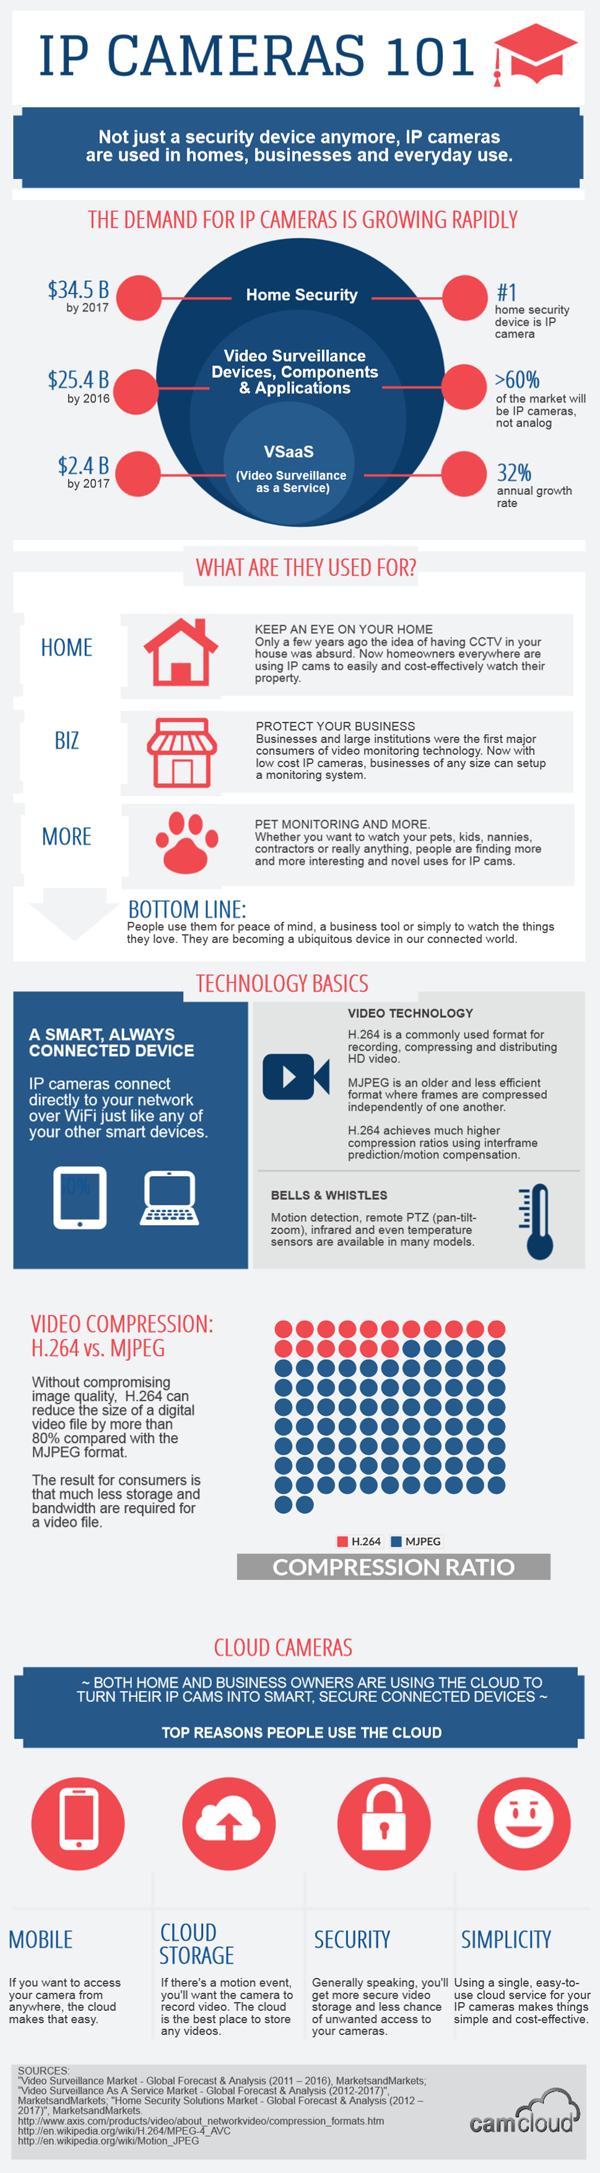 infographic-ip-cameras